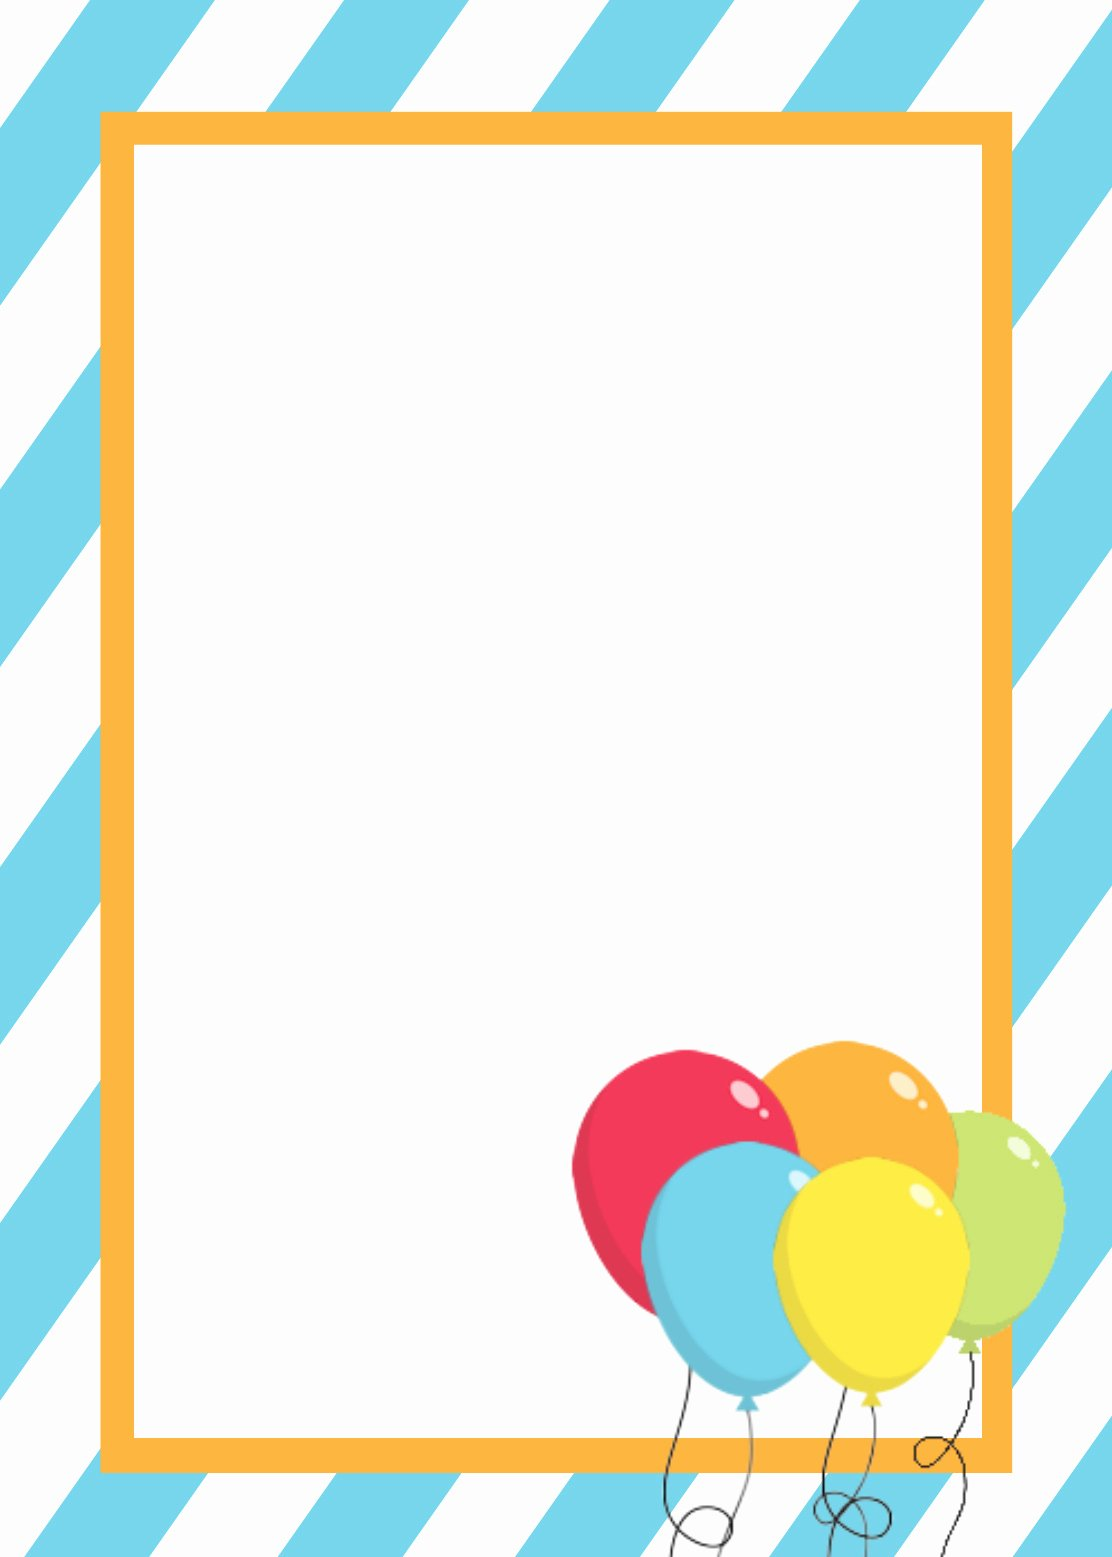 Party Invitation Template Microsoft Word Unique Free Printable Birthday Invitation Templates